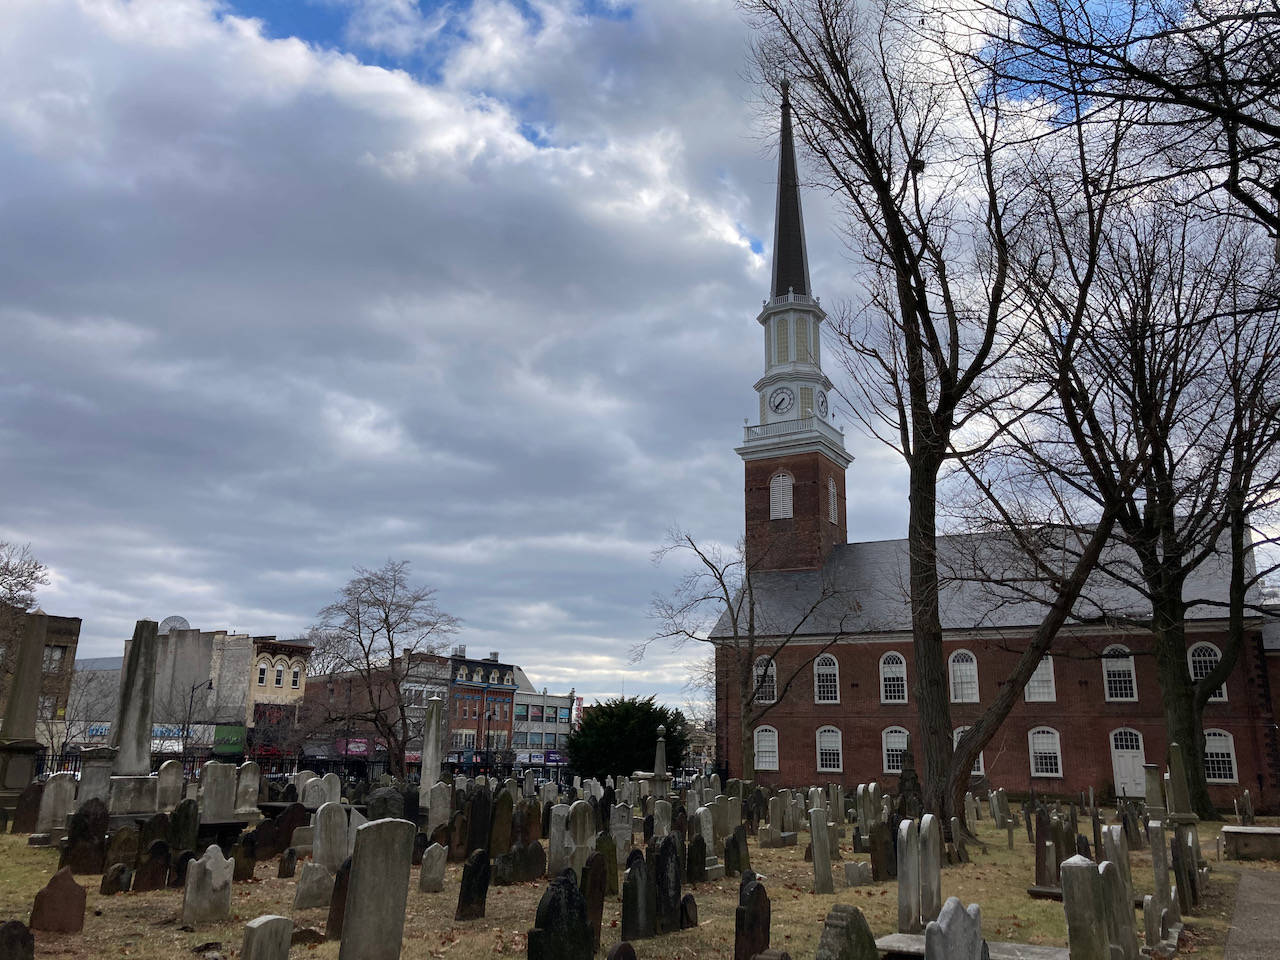 Church cemetery, with Presbyterian Church in background.